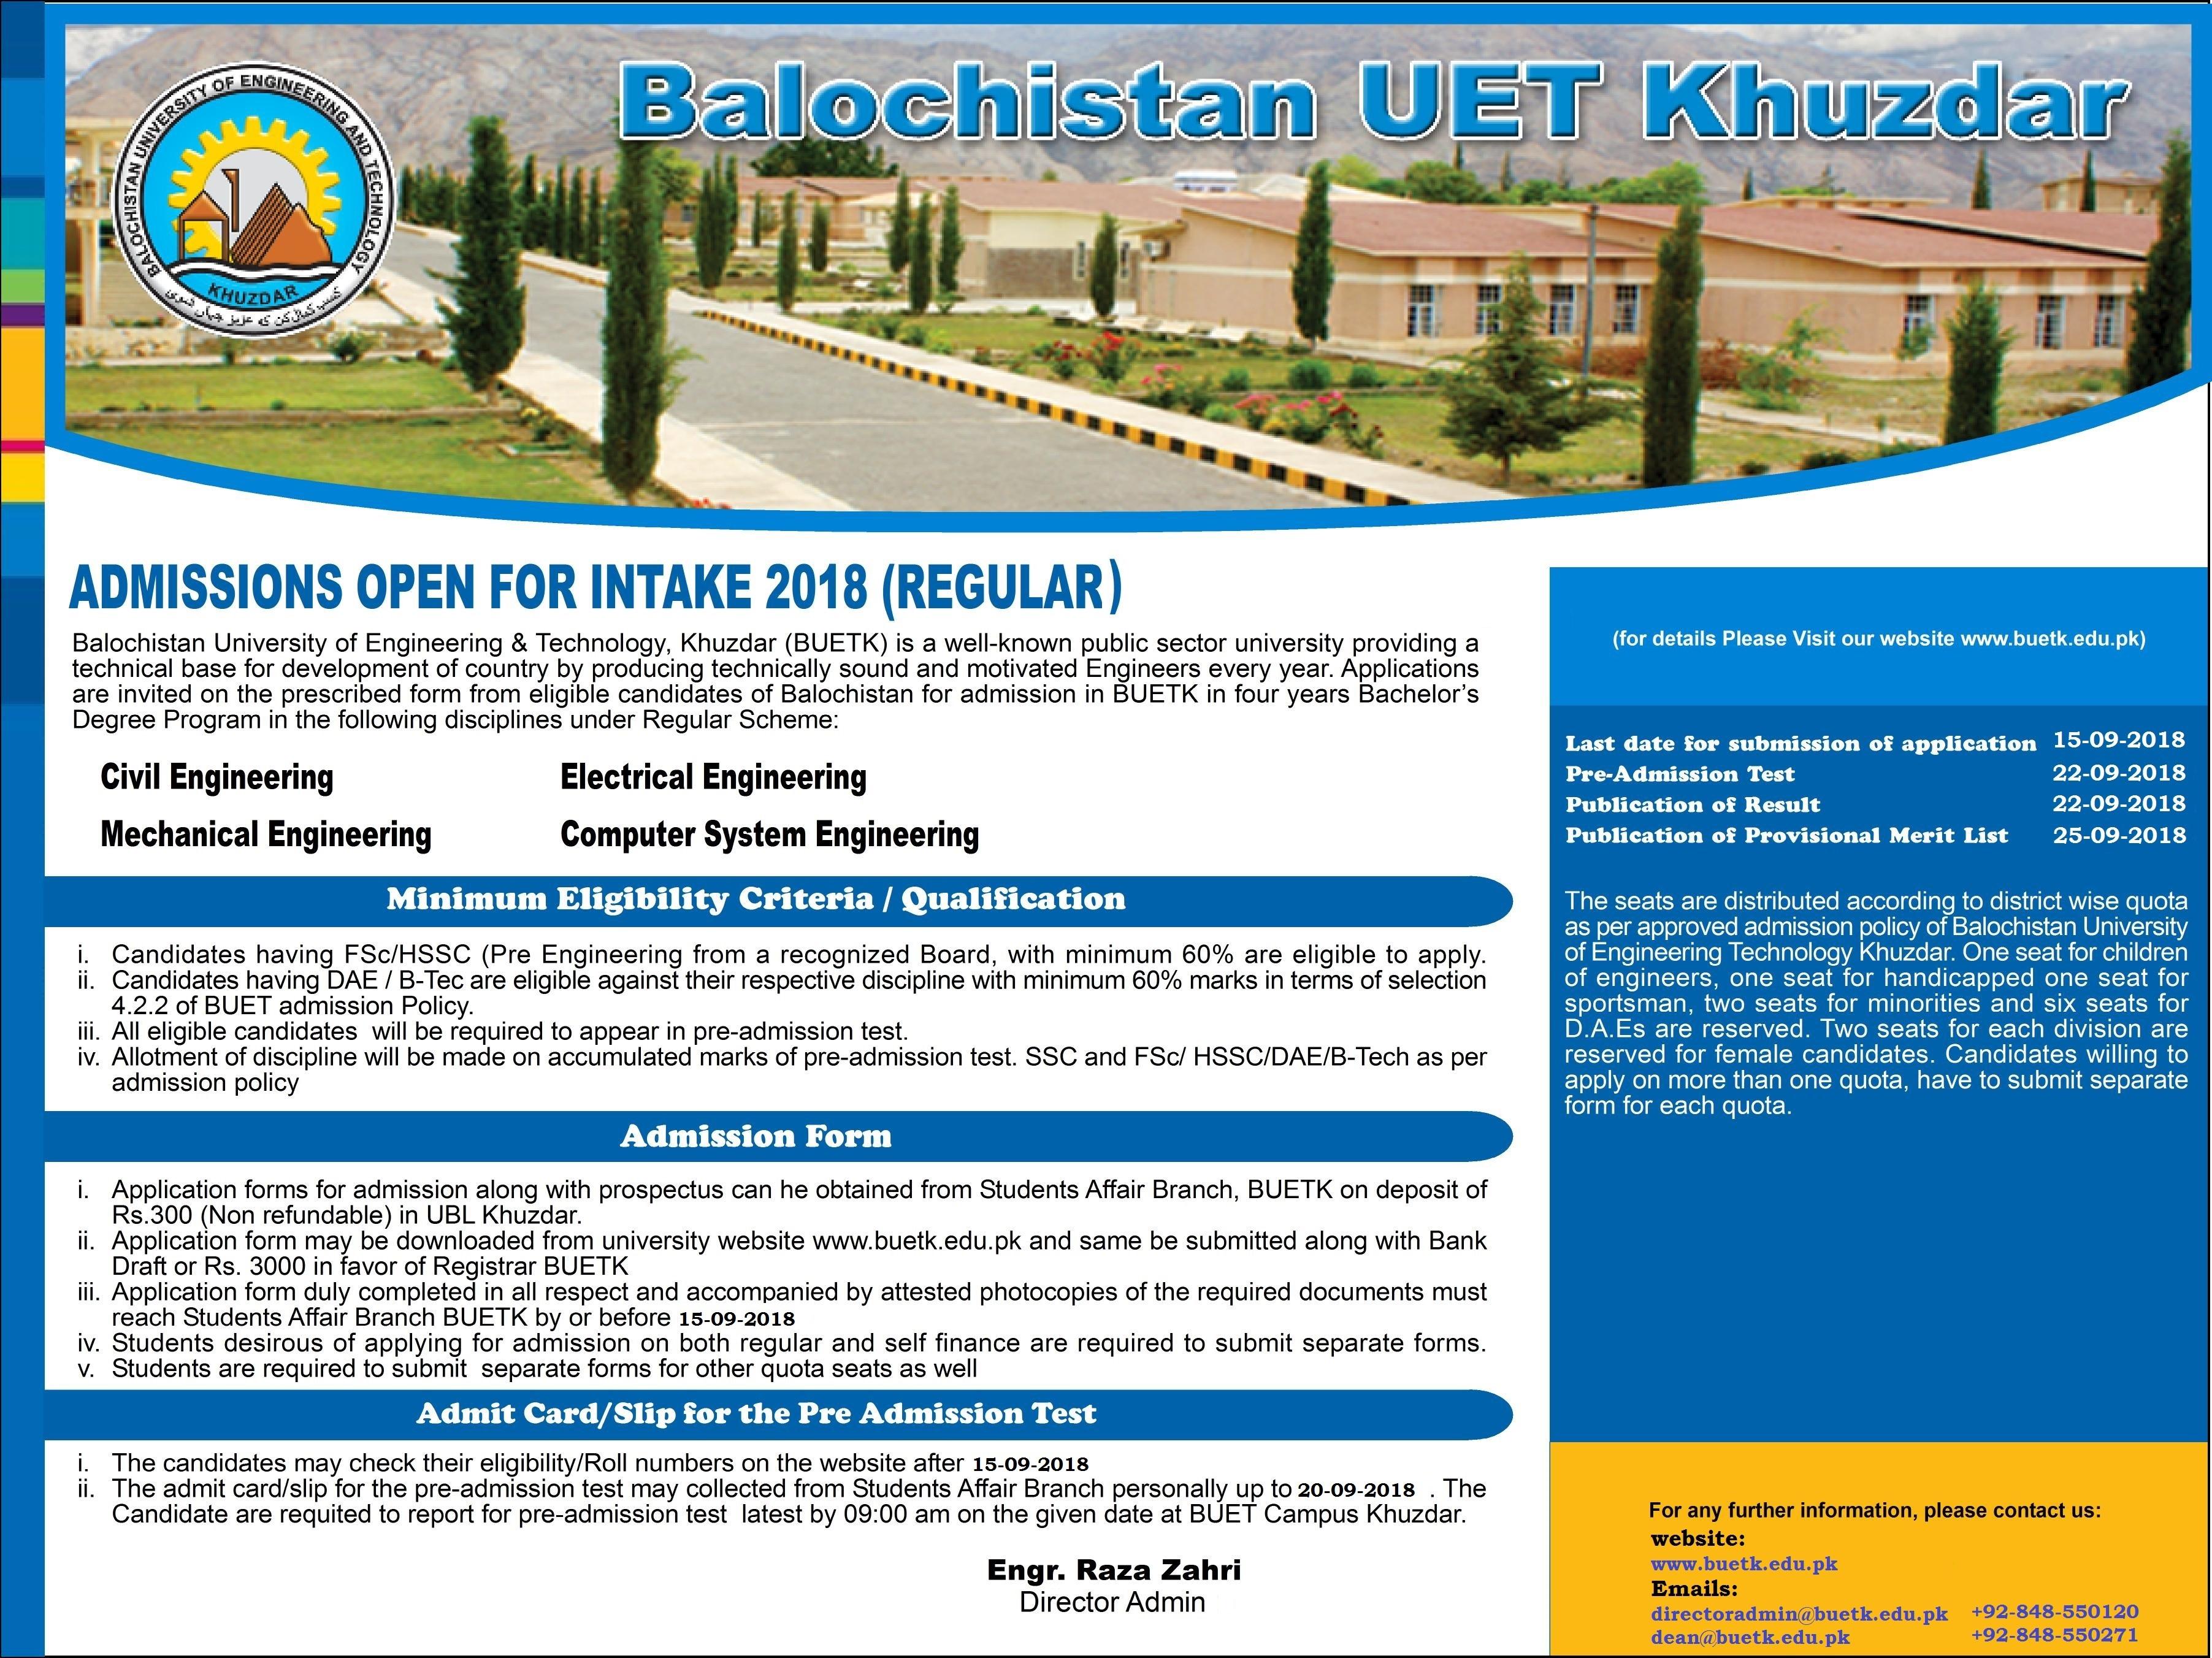 Balochistan University of Engineering BUET Khuzdar Admission 2018